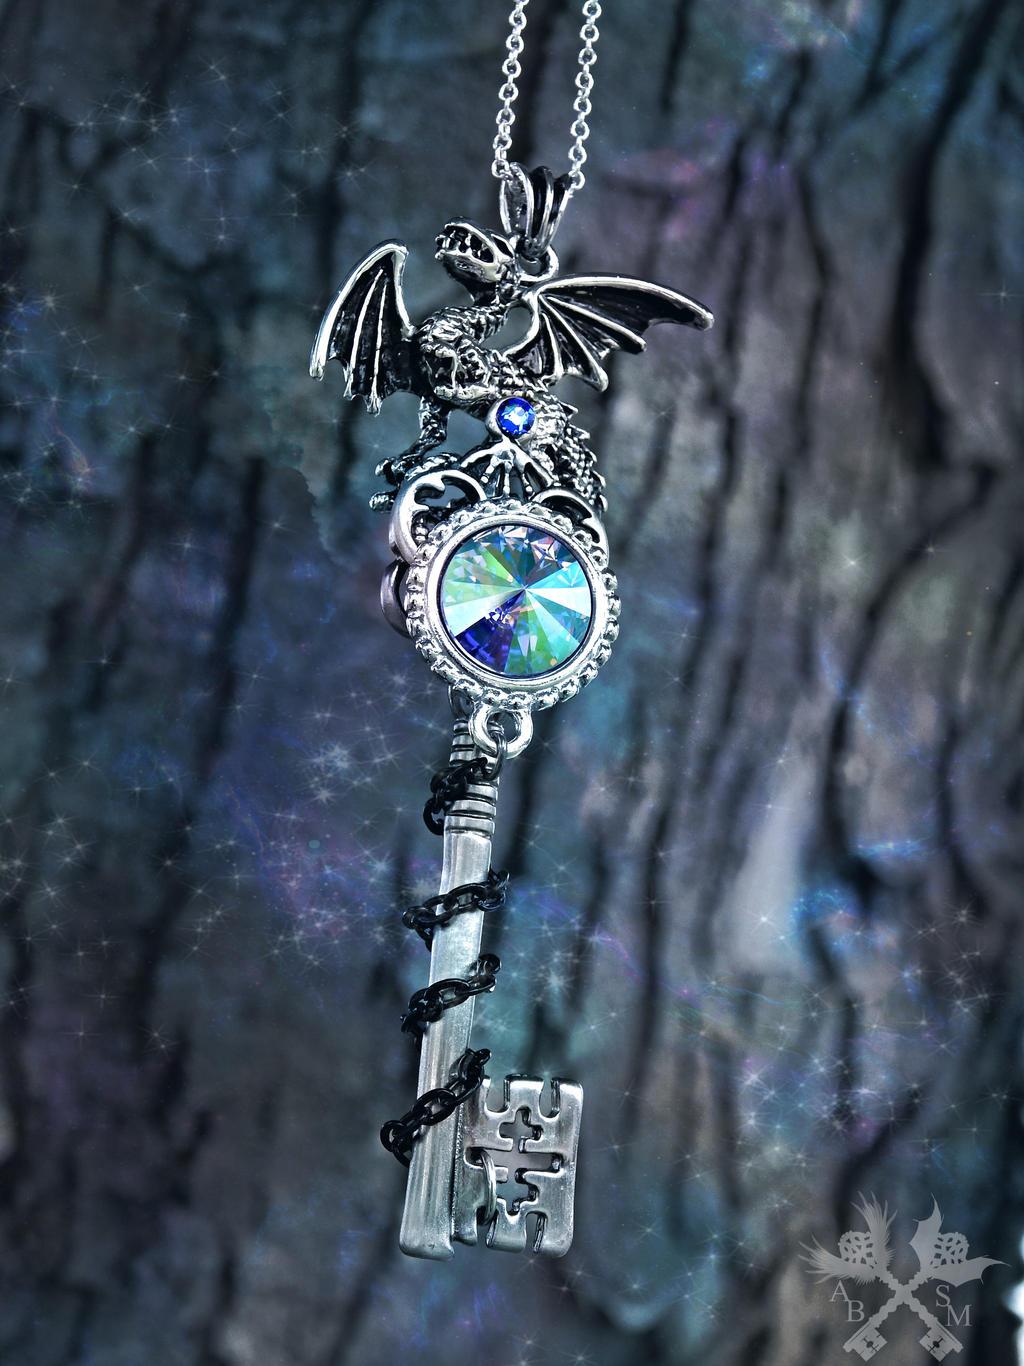 Ice Hatchling Fantasy Key Necklace